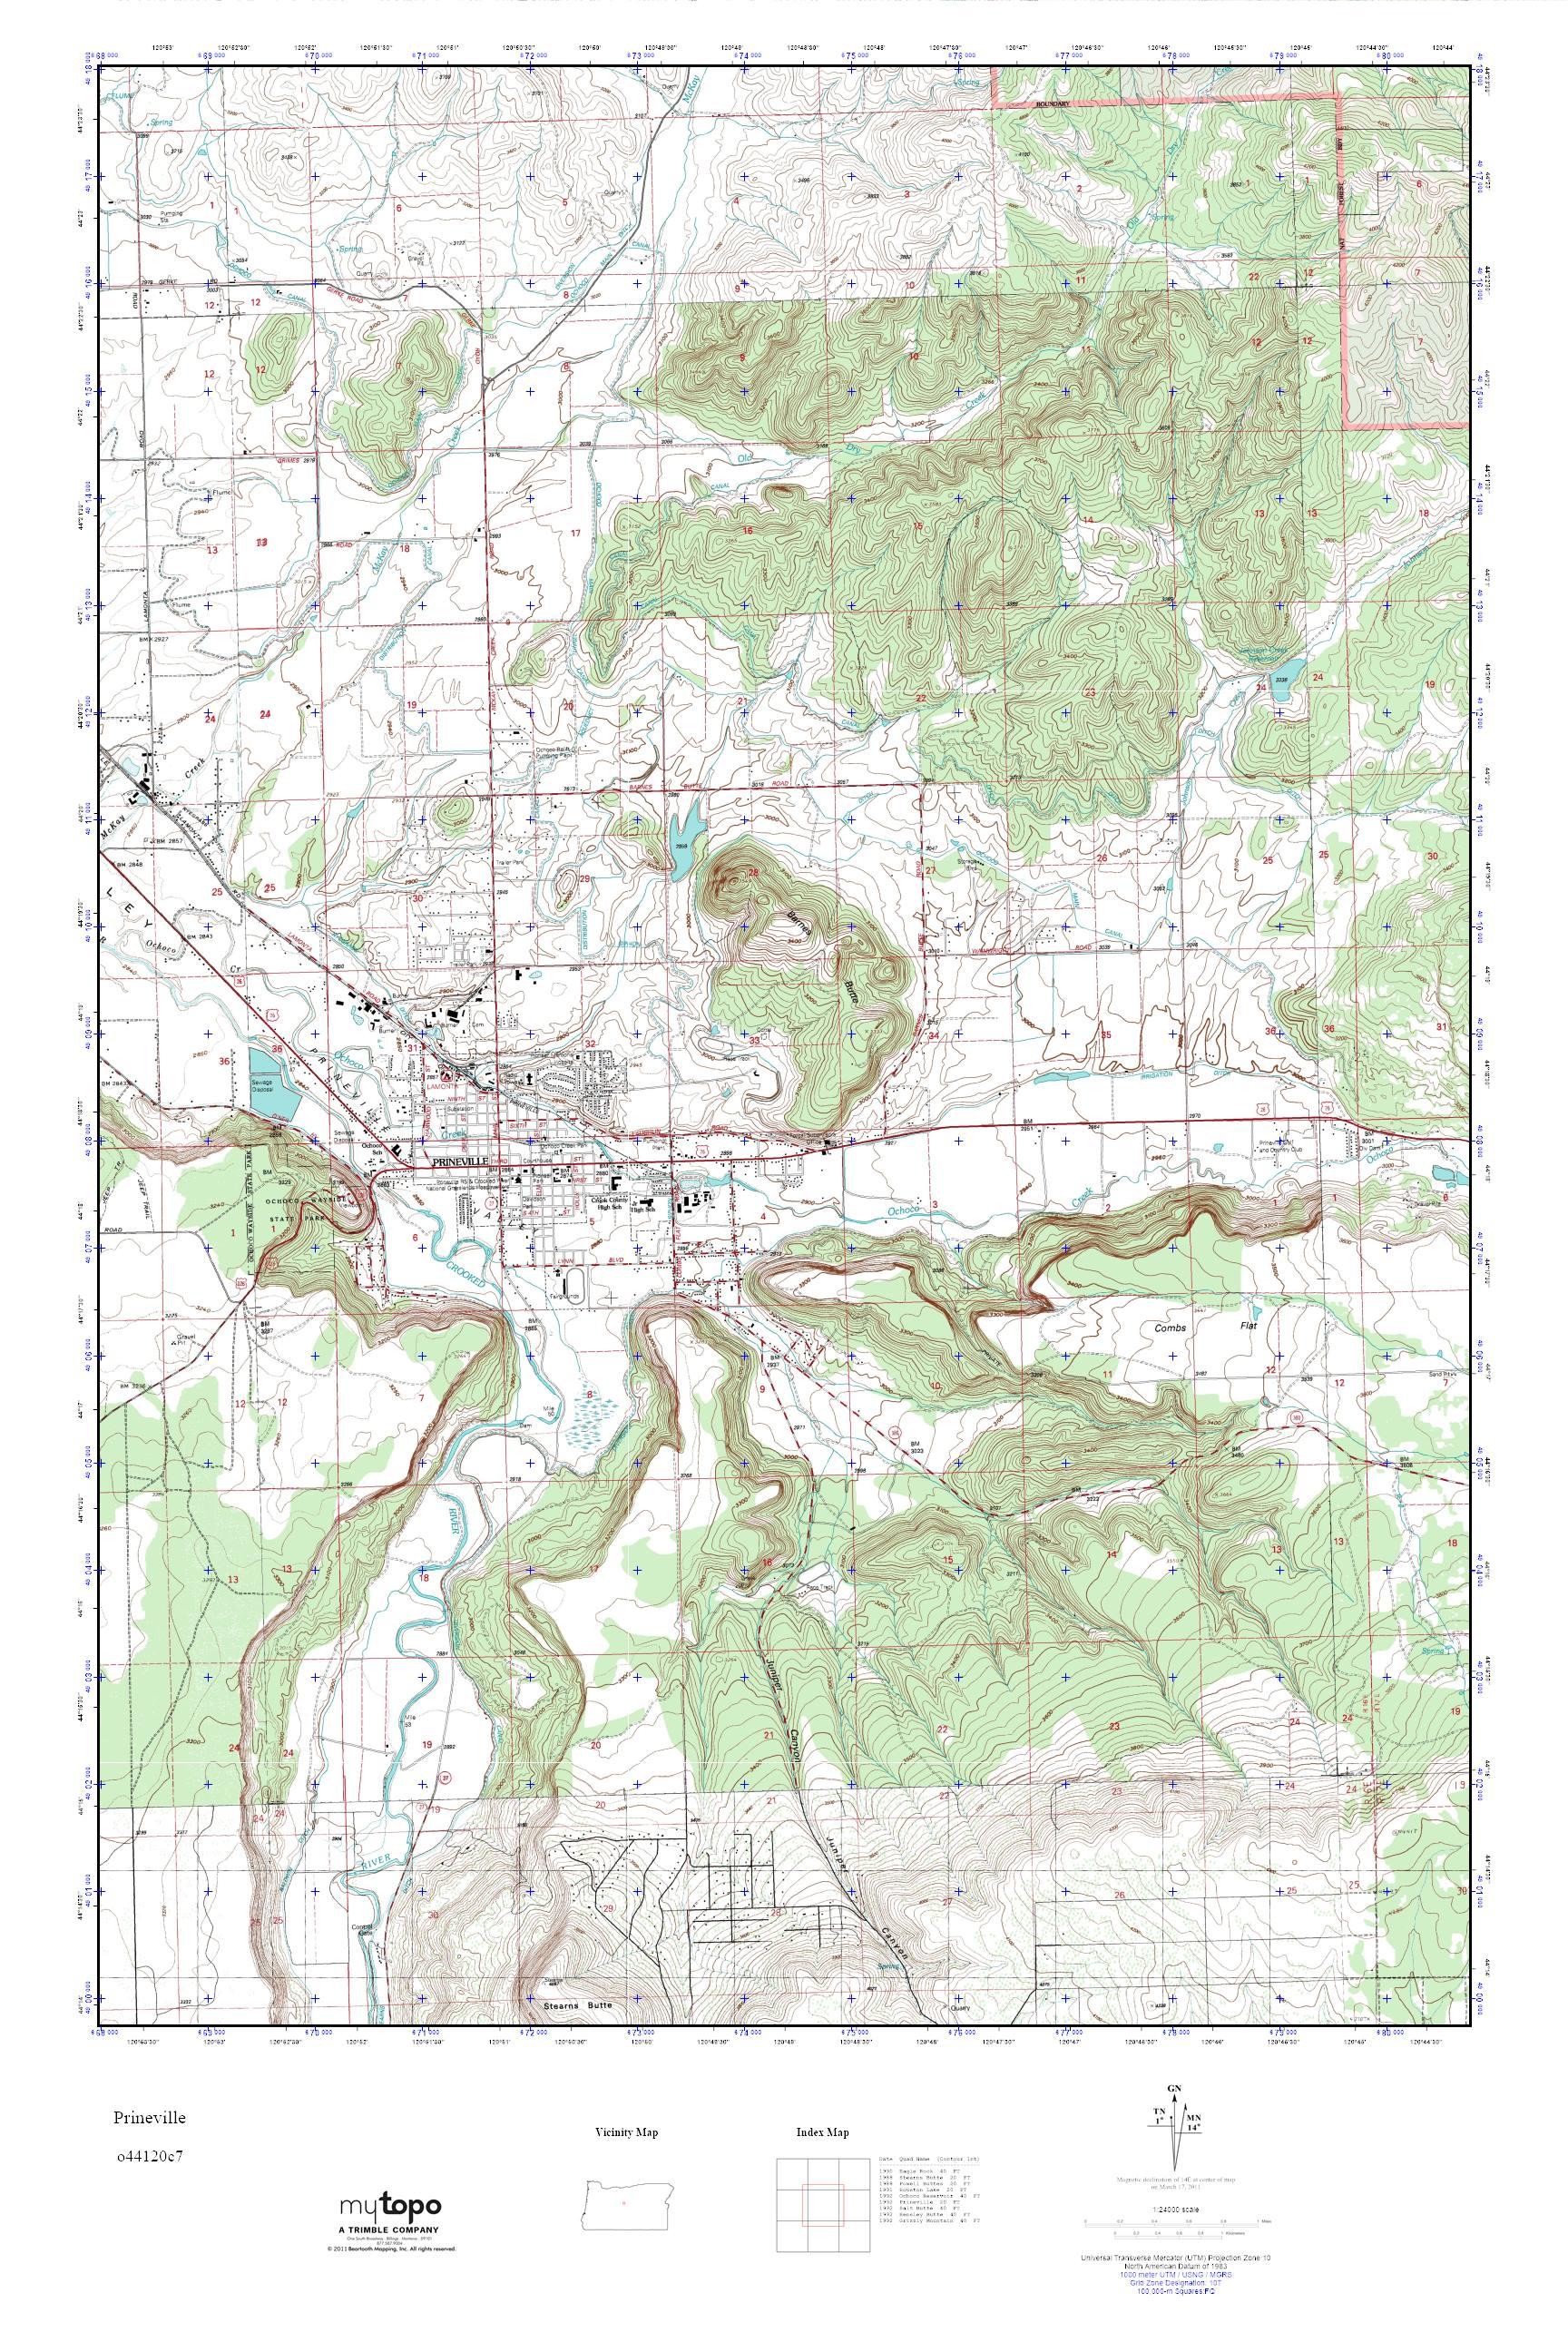 Mytopo Prineville Oregon Usgs Quad Topo Map